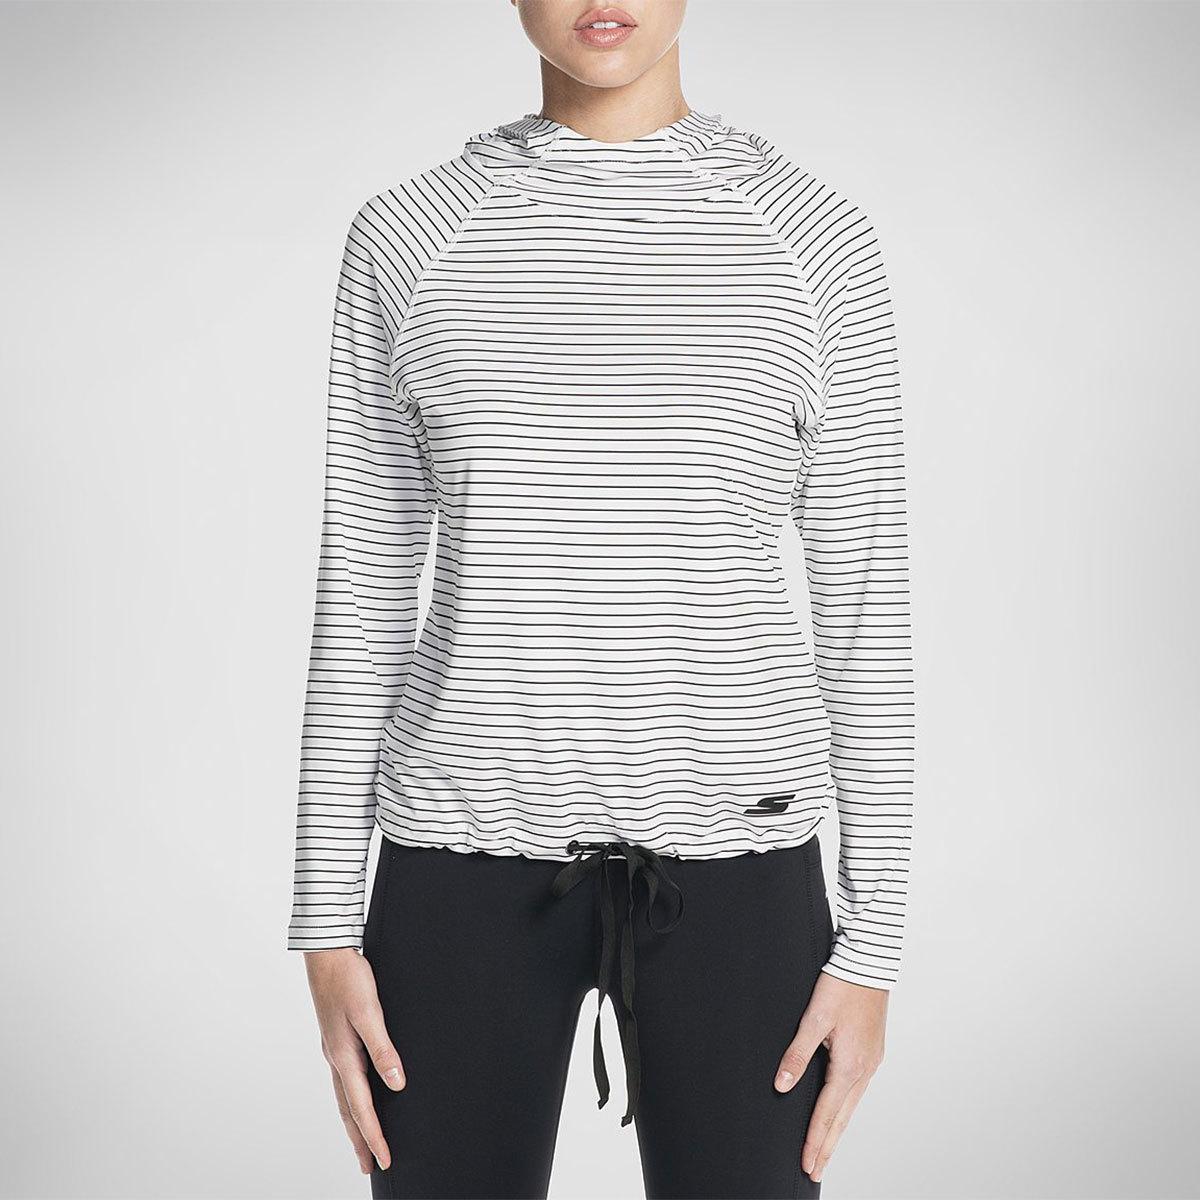 Skechers Women's Chakra Stripe Long-Sleeve Pullover Top - White, S